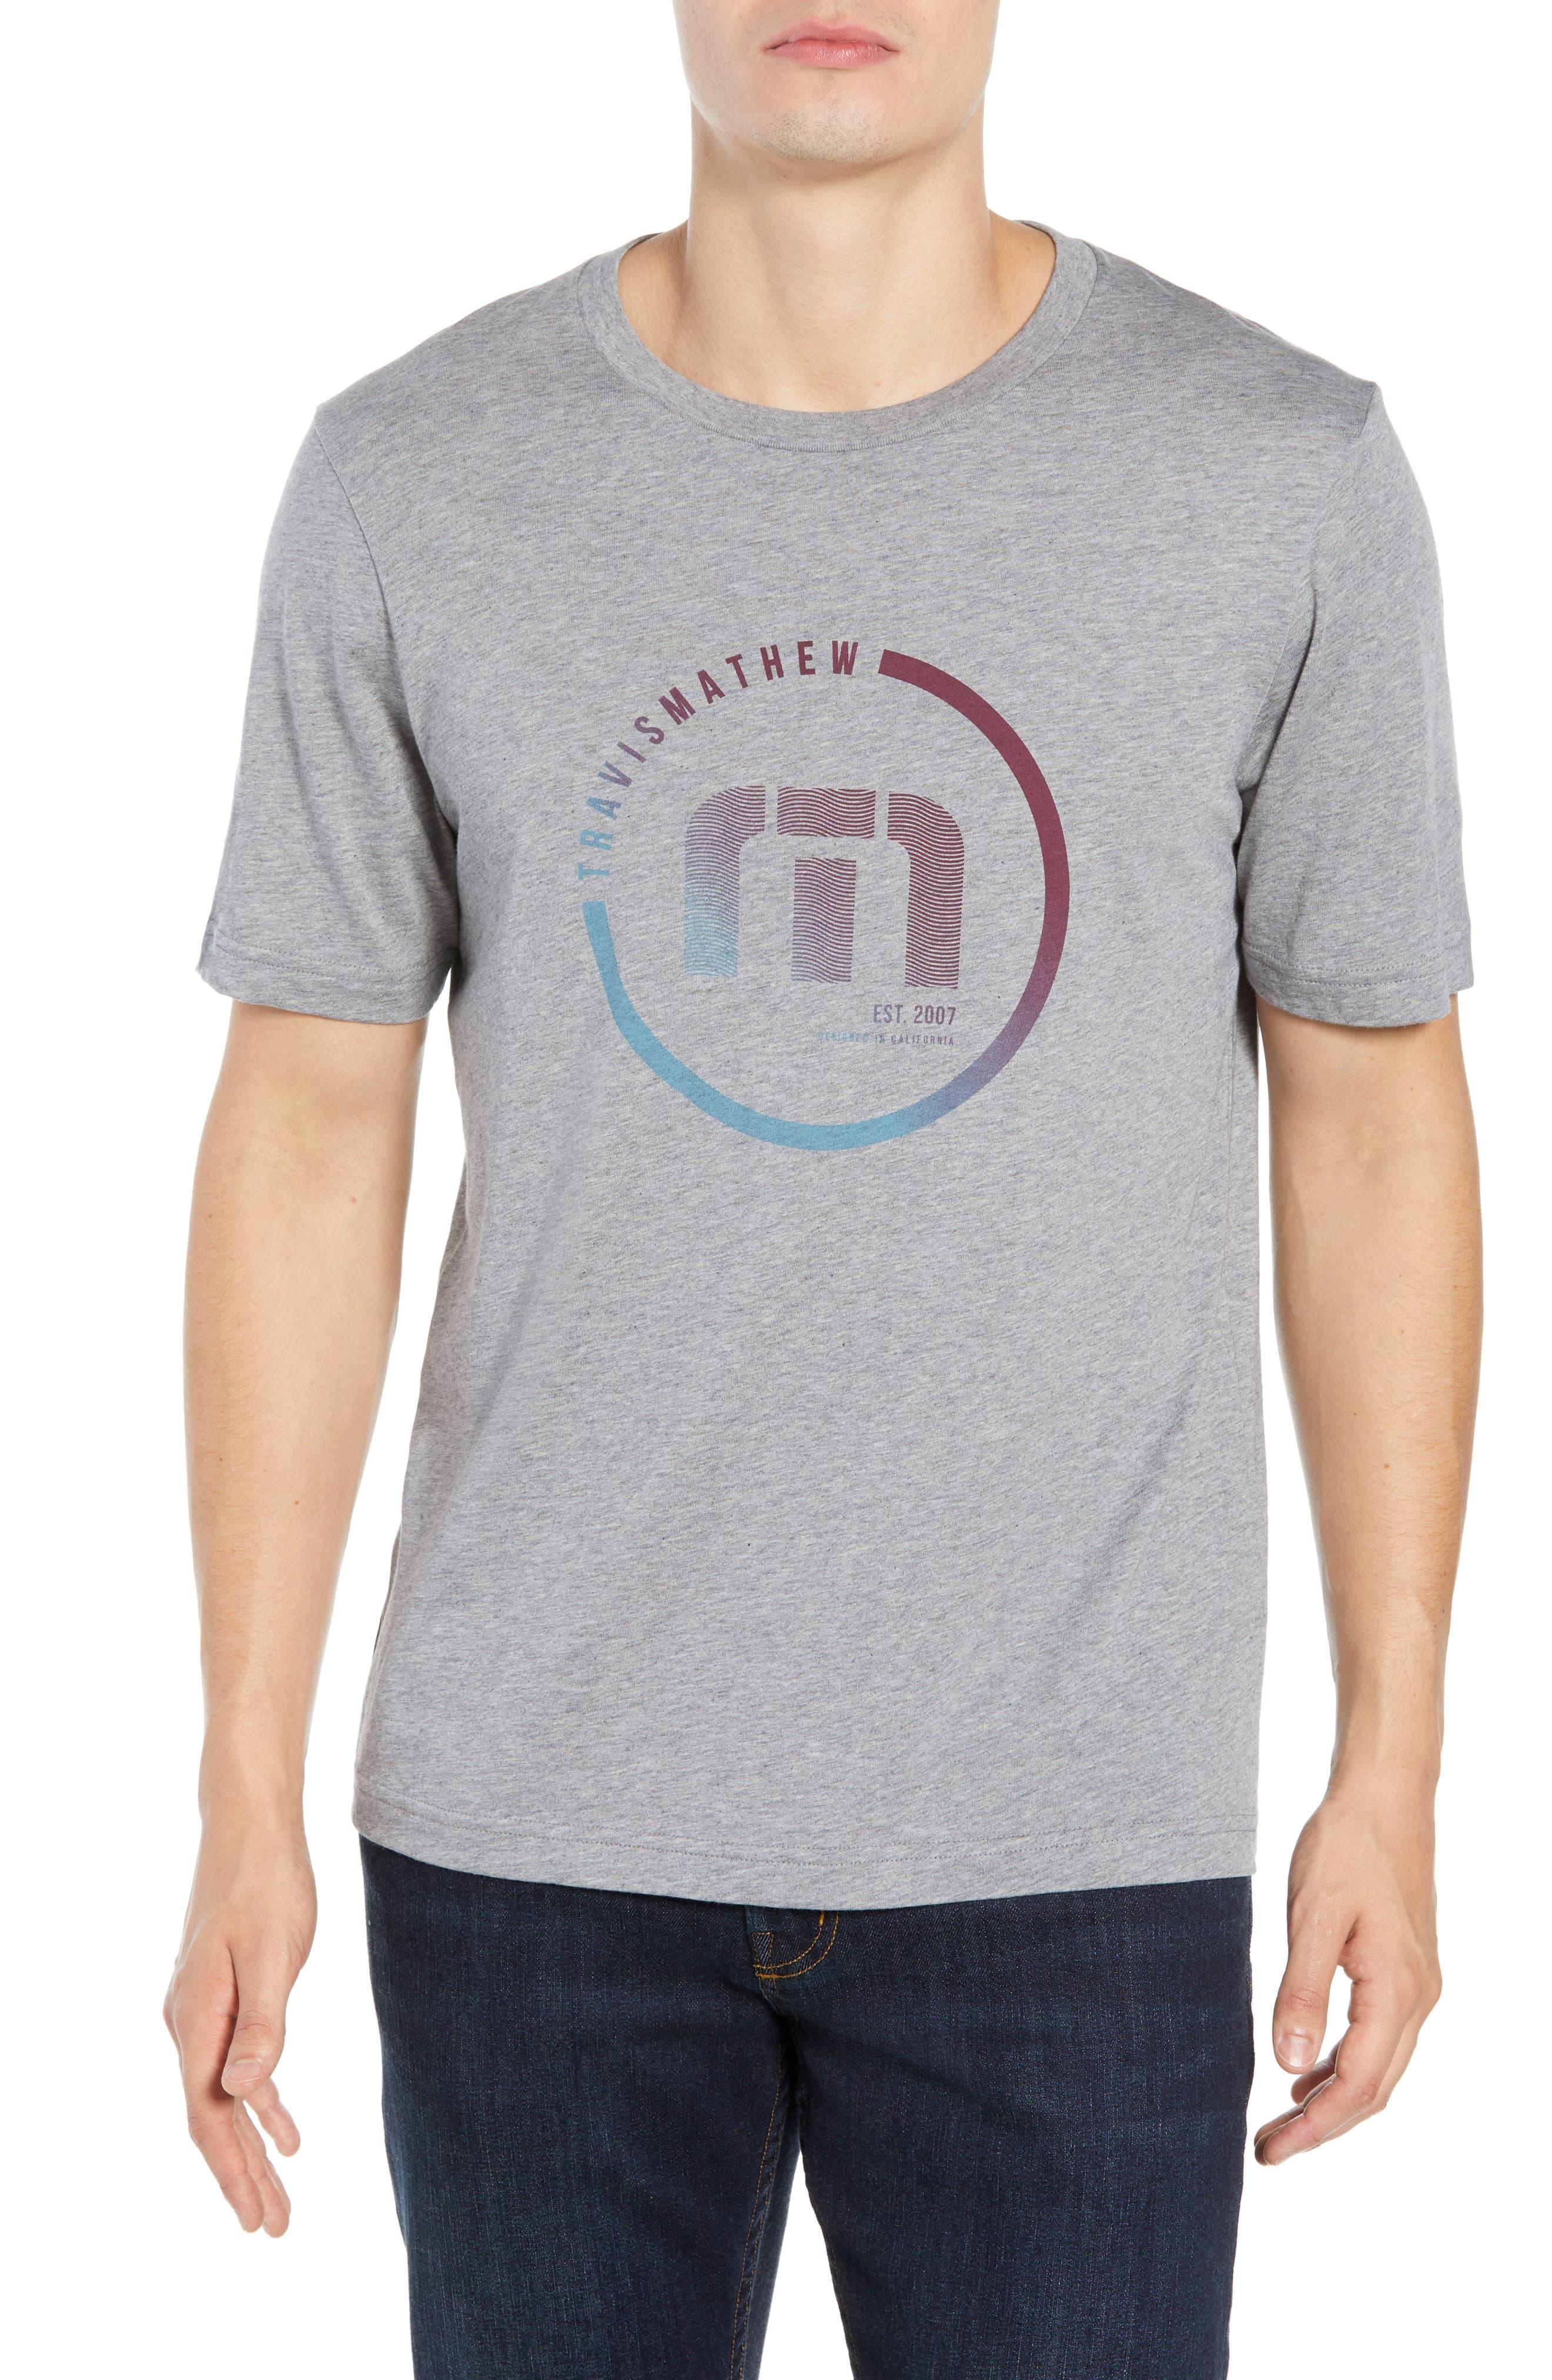 Airheads T-Shirt,                             Main thumbnail 1, color,                             HEATHER GREY